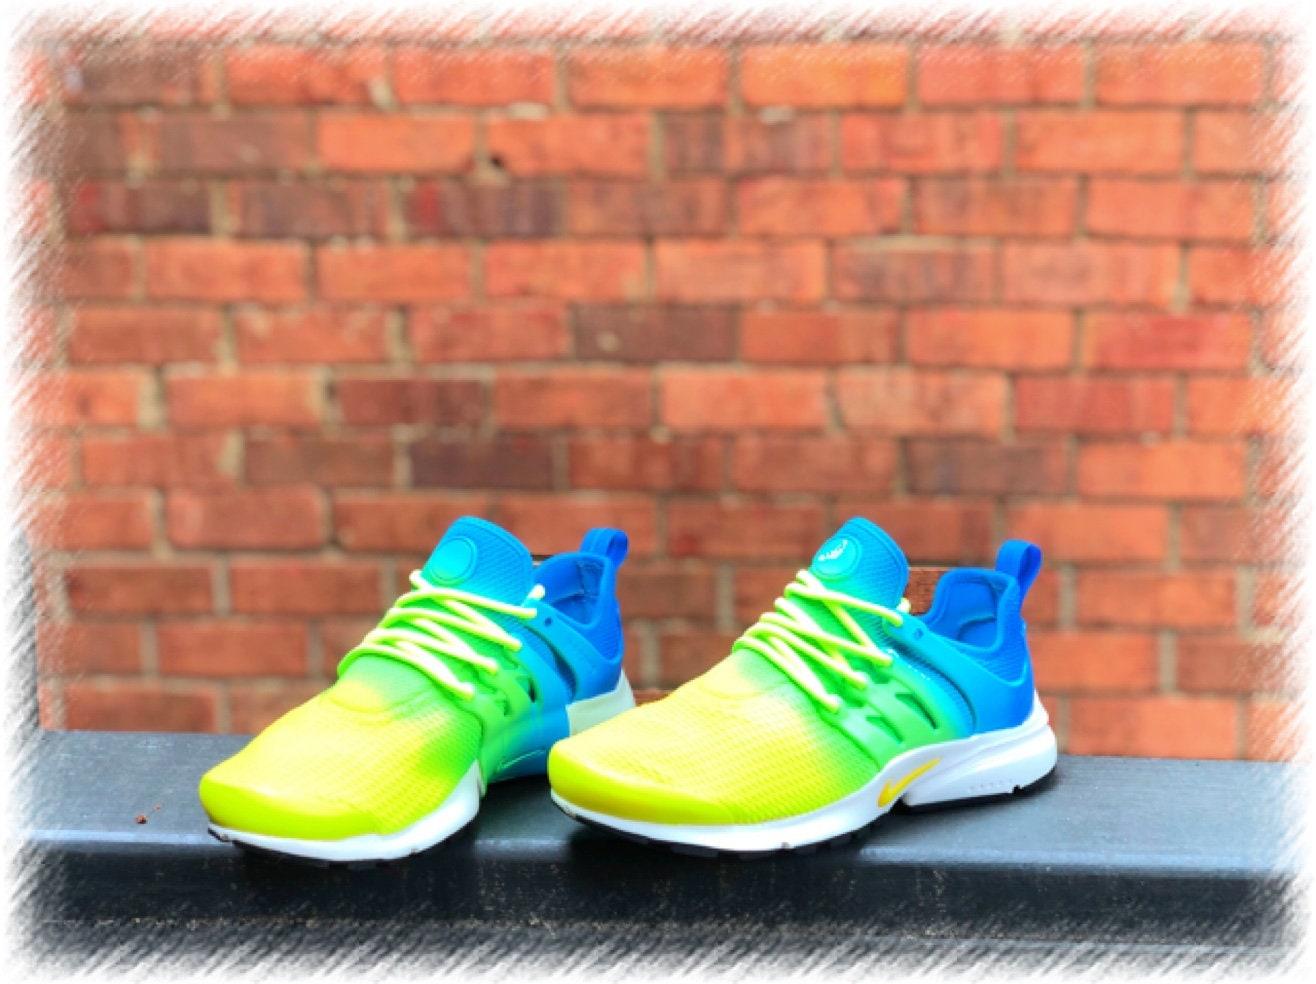 dbd258f7a3d0b Summer Colors Nike Presto Customz